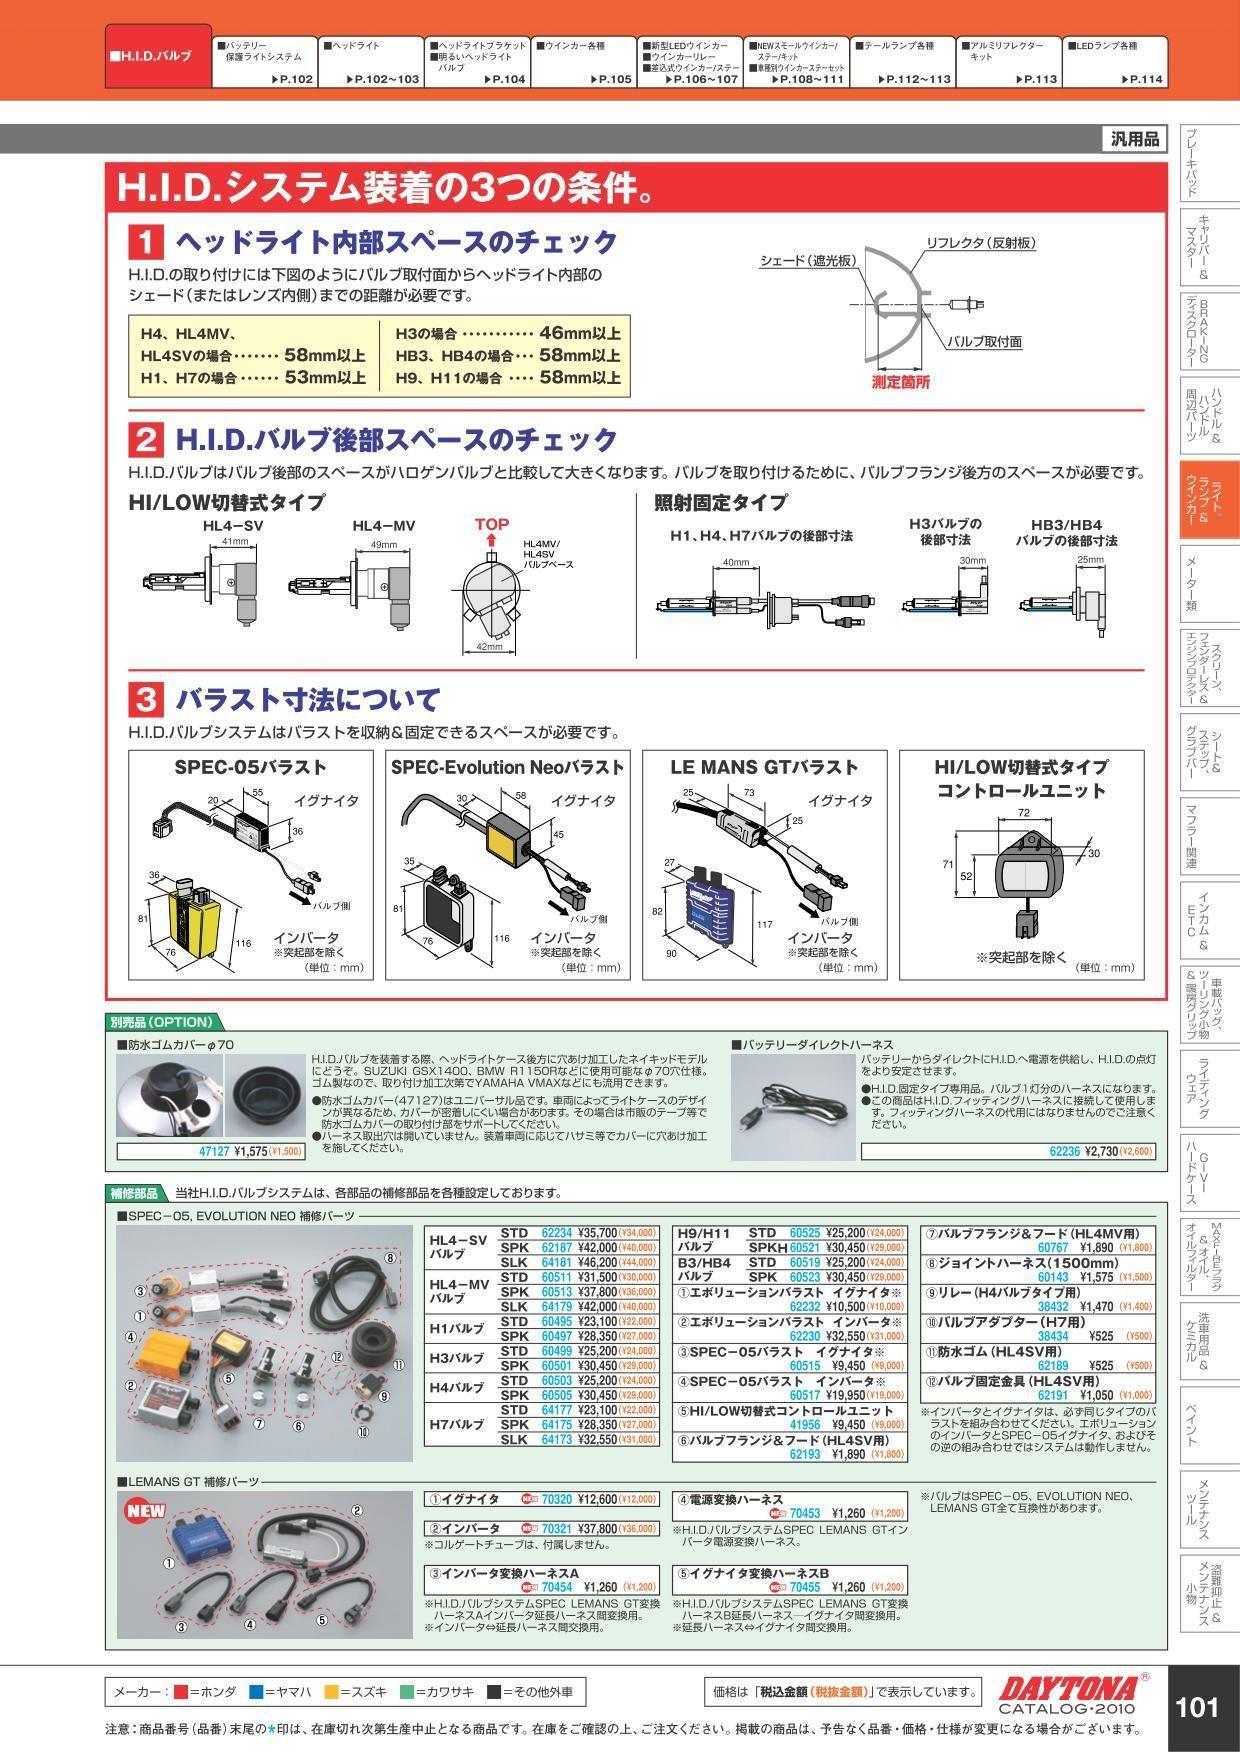 【DAYTONA】維修用 HID點火器轉換配線 (B Le Mans G) - 「Webike-摩托百貨」